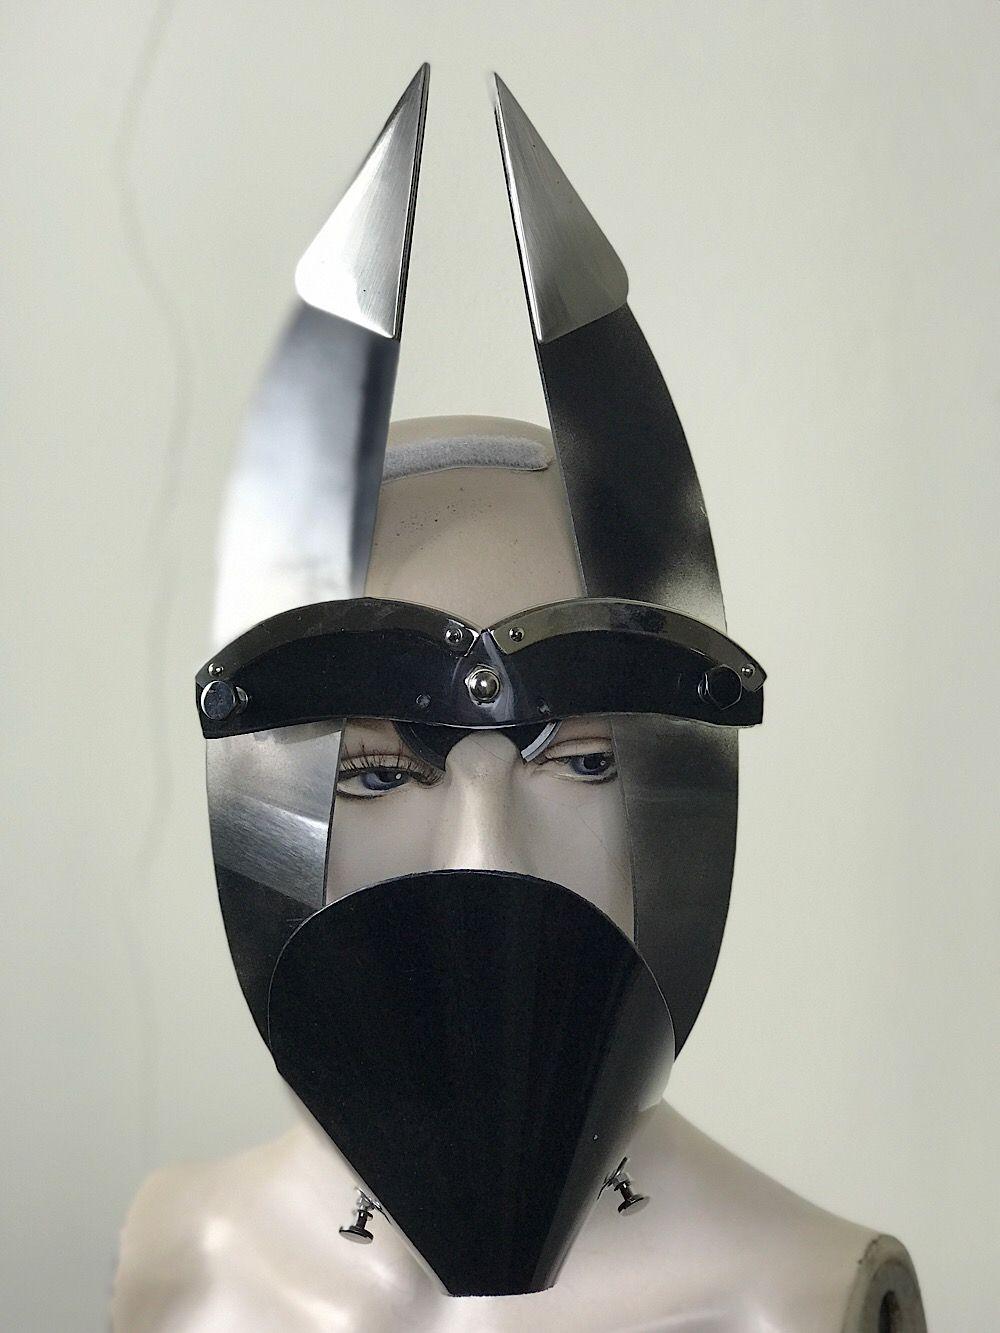 2d9e676901ce Black mask with triangular horns muzzle styling video, costume   Hi Tek  Webstore